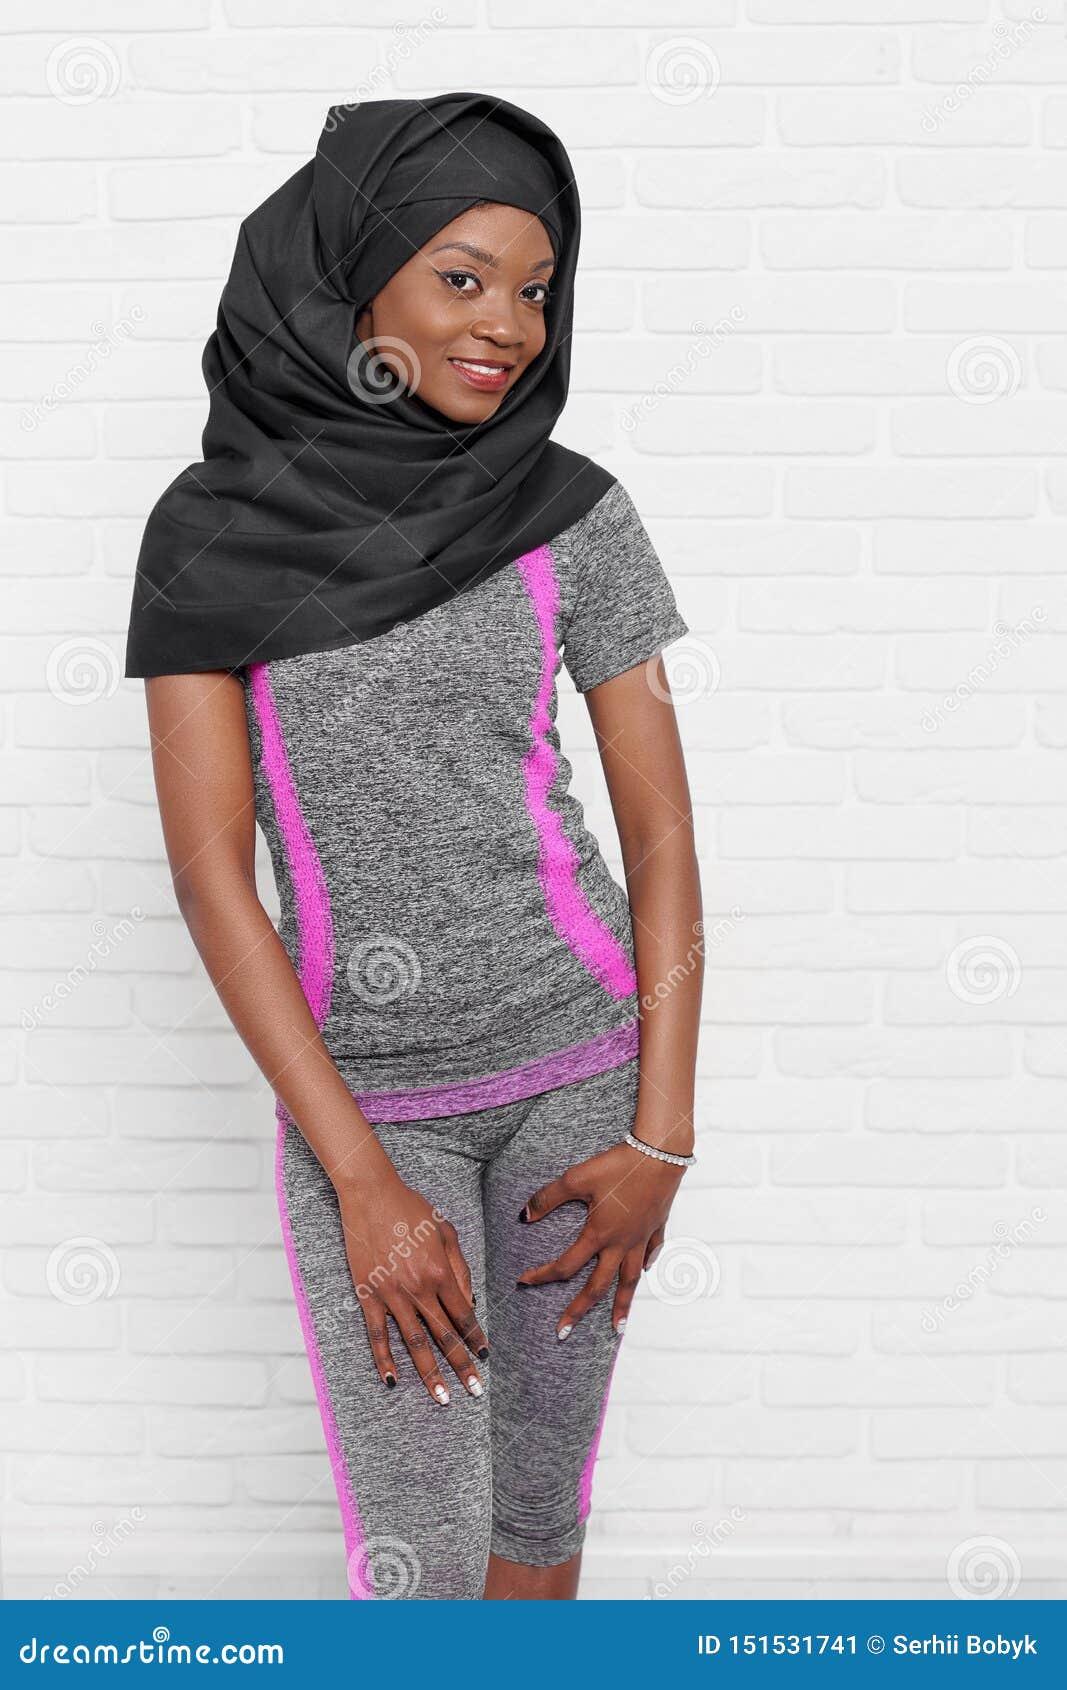 Hijab Model Poses